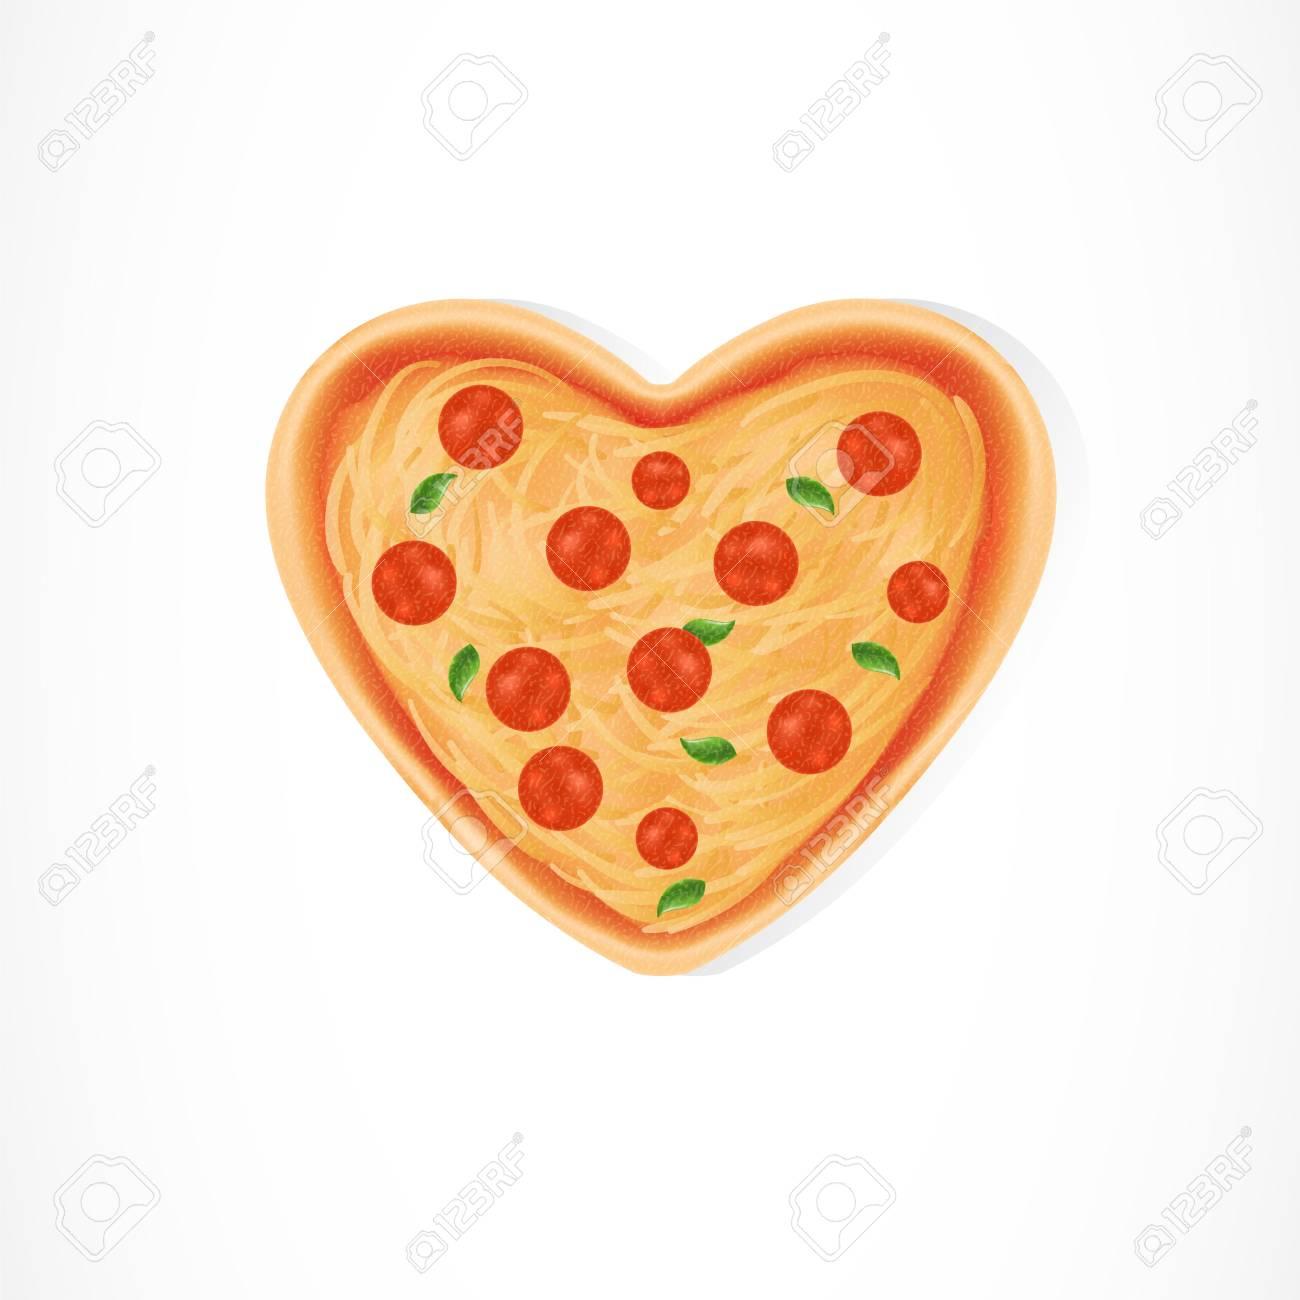 Heart shaped pizza illustration on white background...